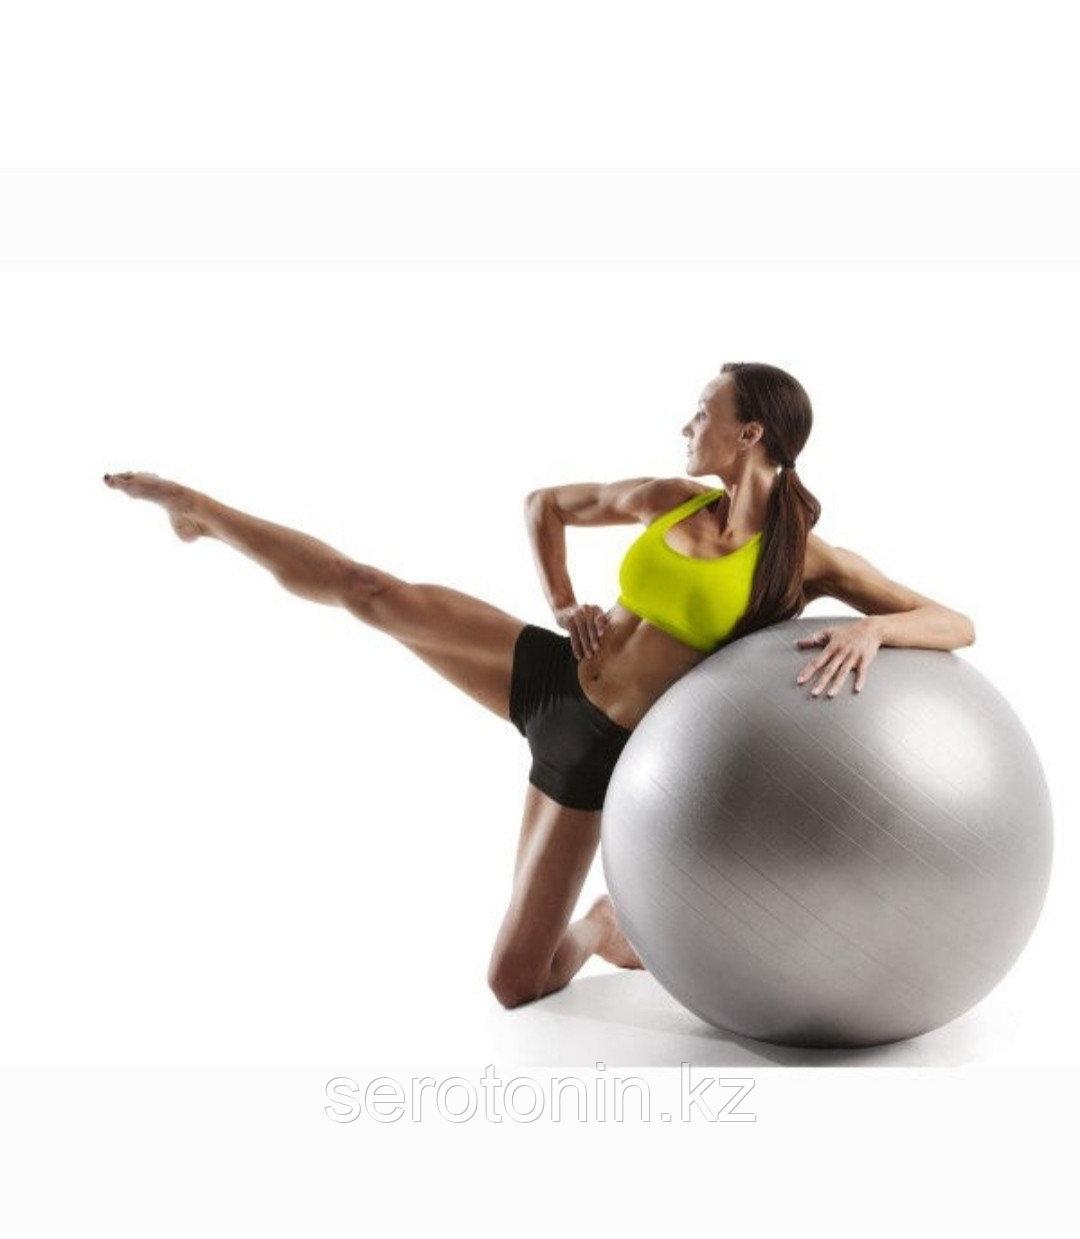 Мяч гимнастический (Фитбол) 75 см - фото 4